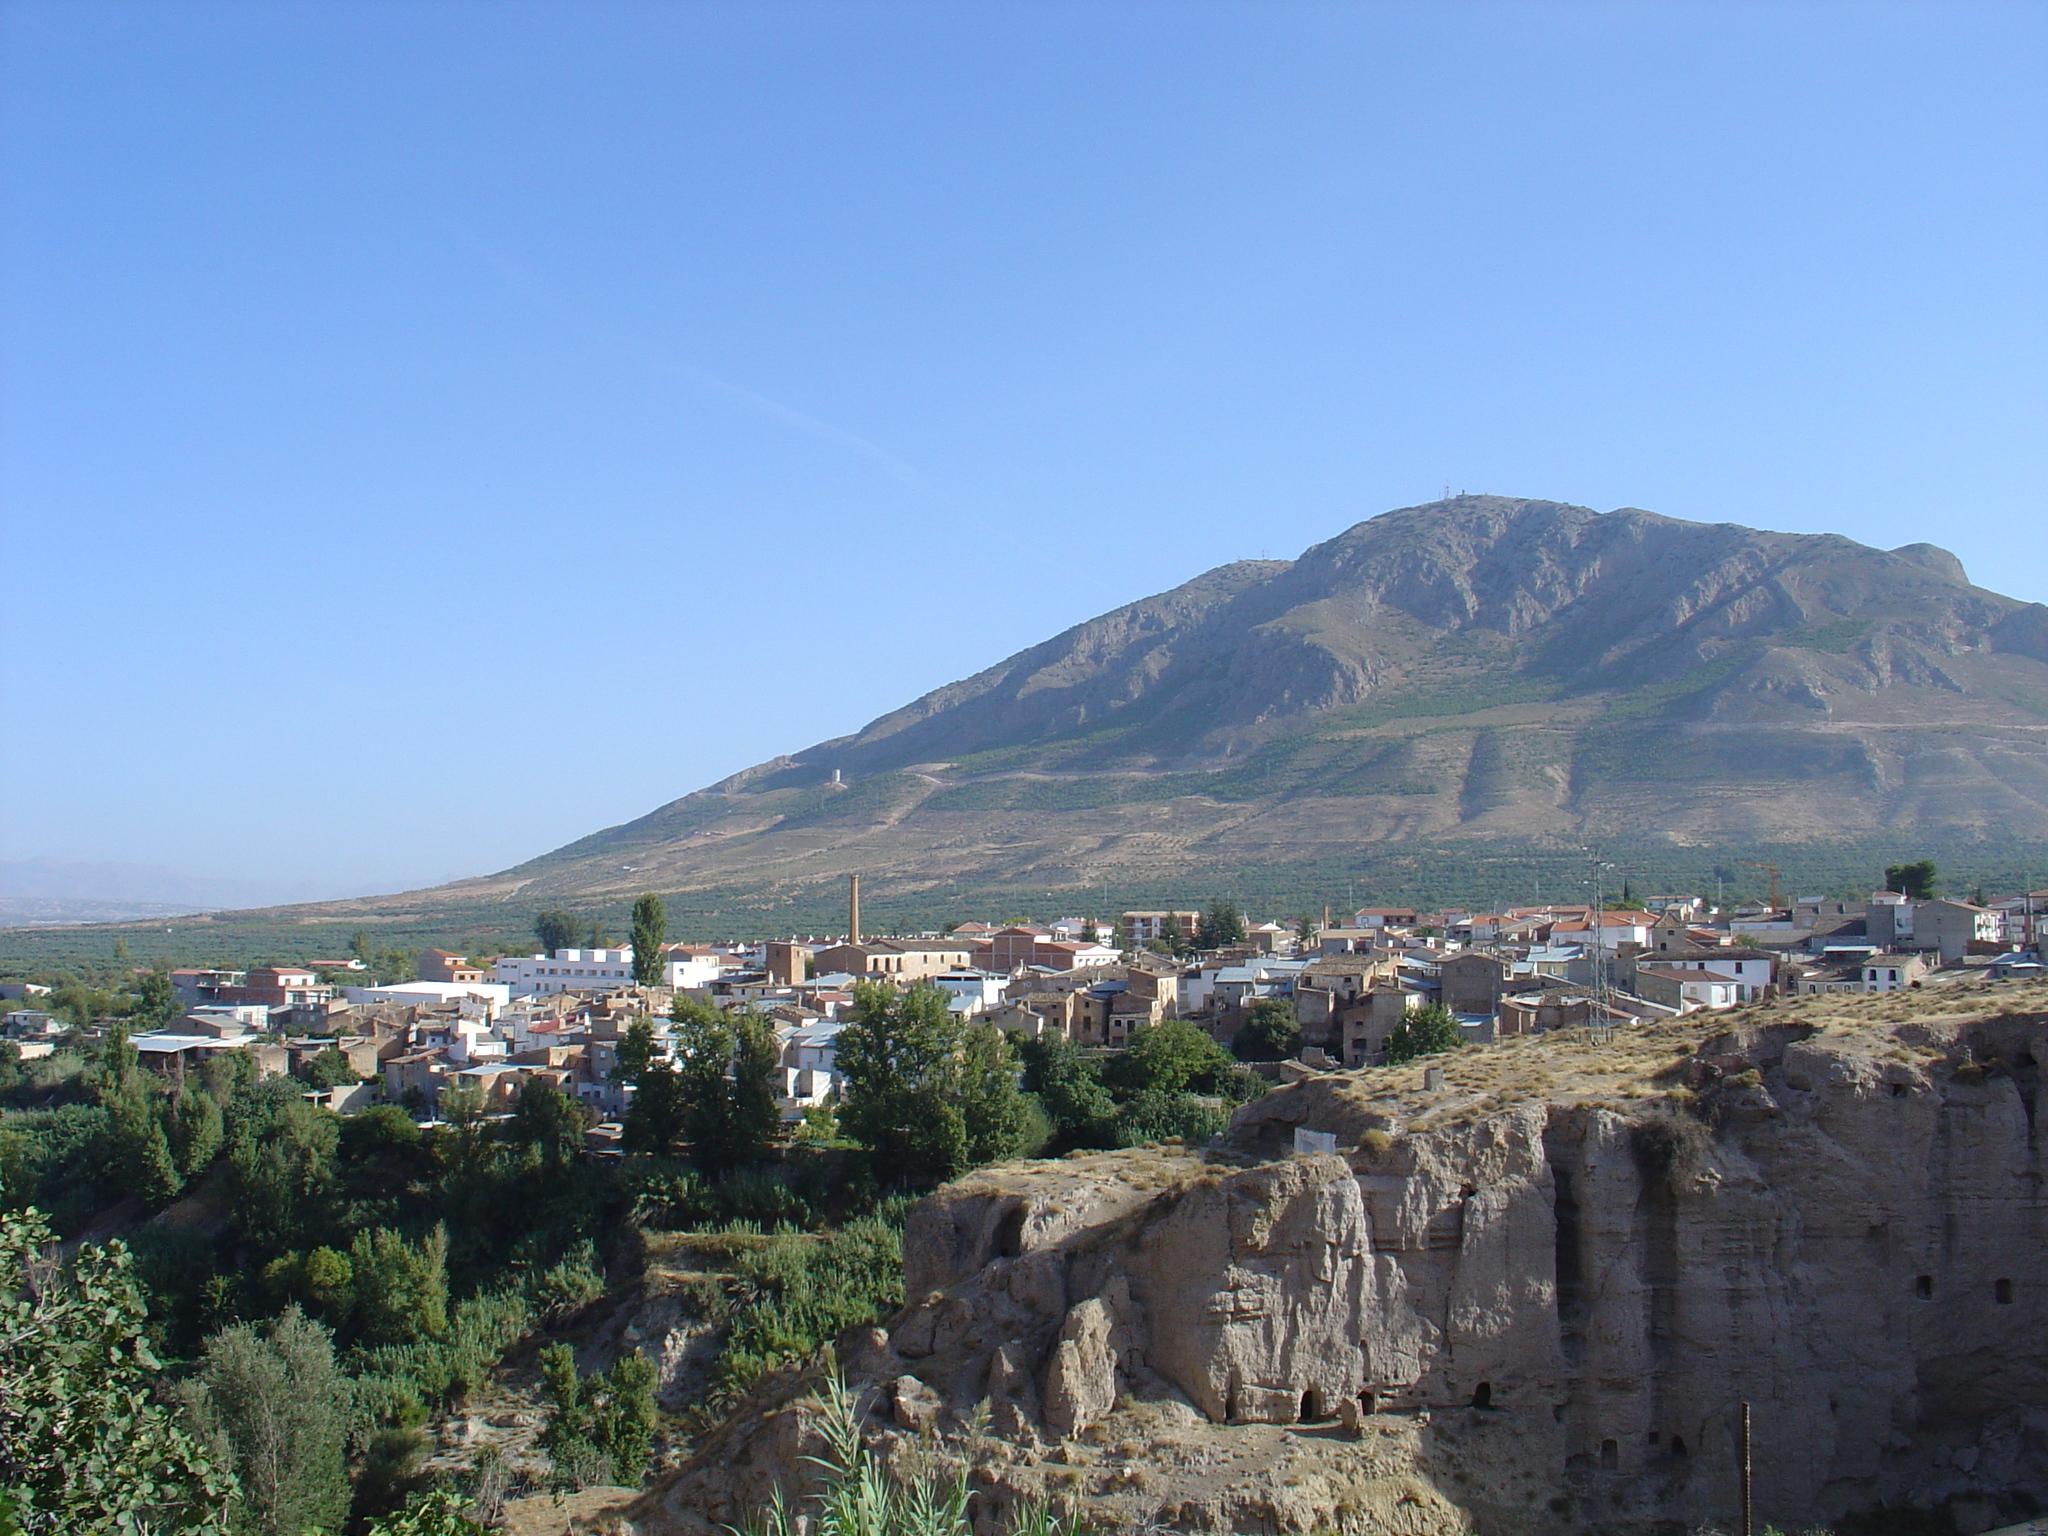 CerroJabalcon